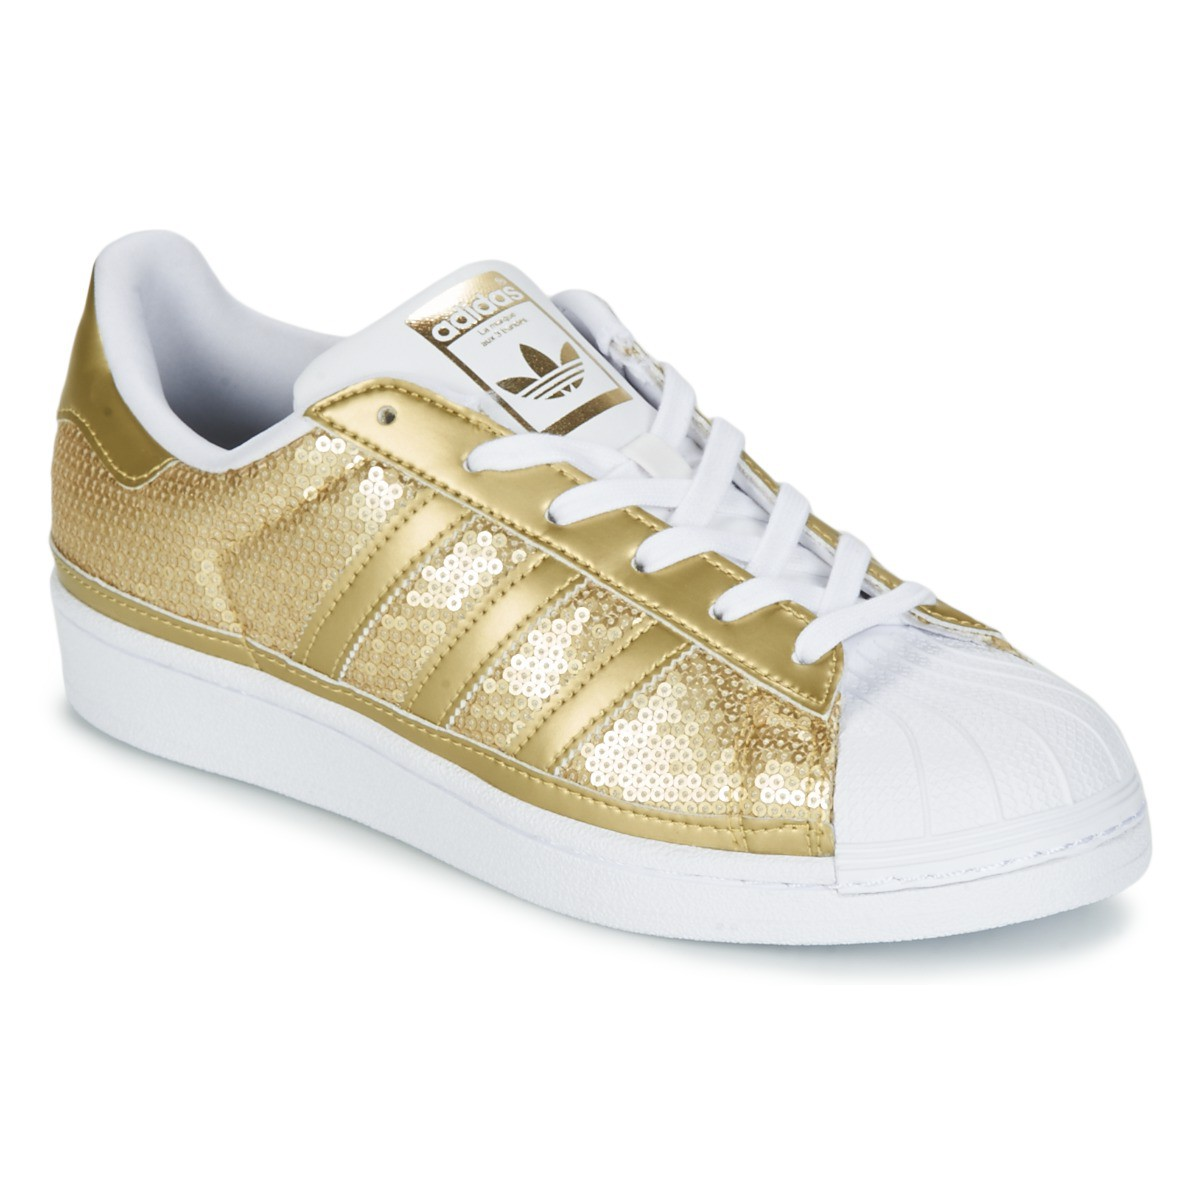 adidas superstar femme blanc or